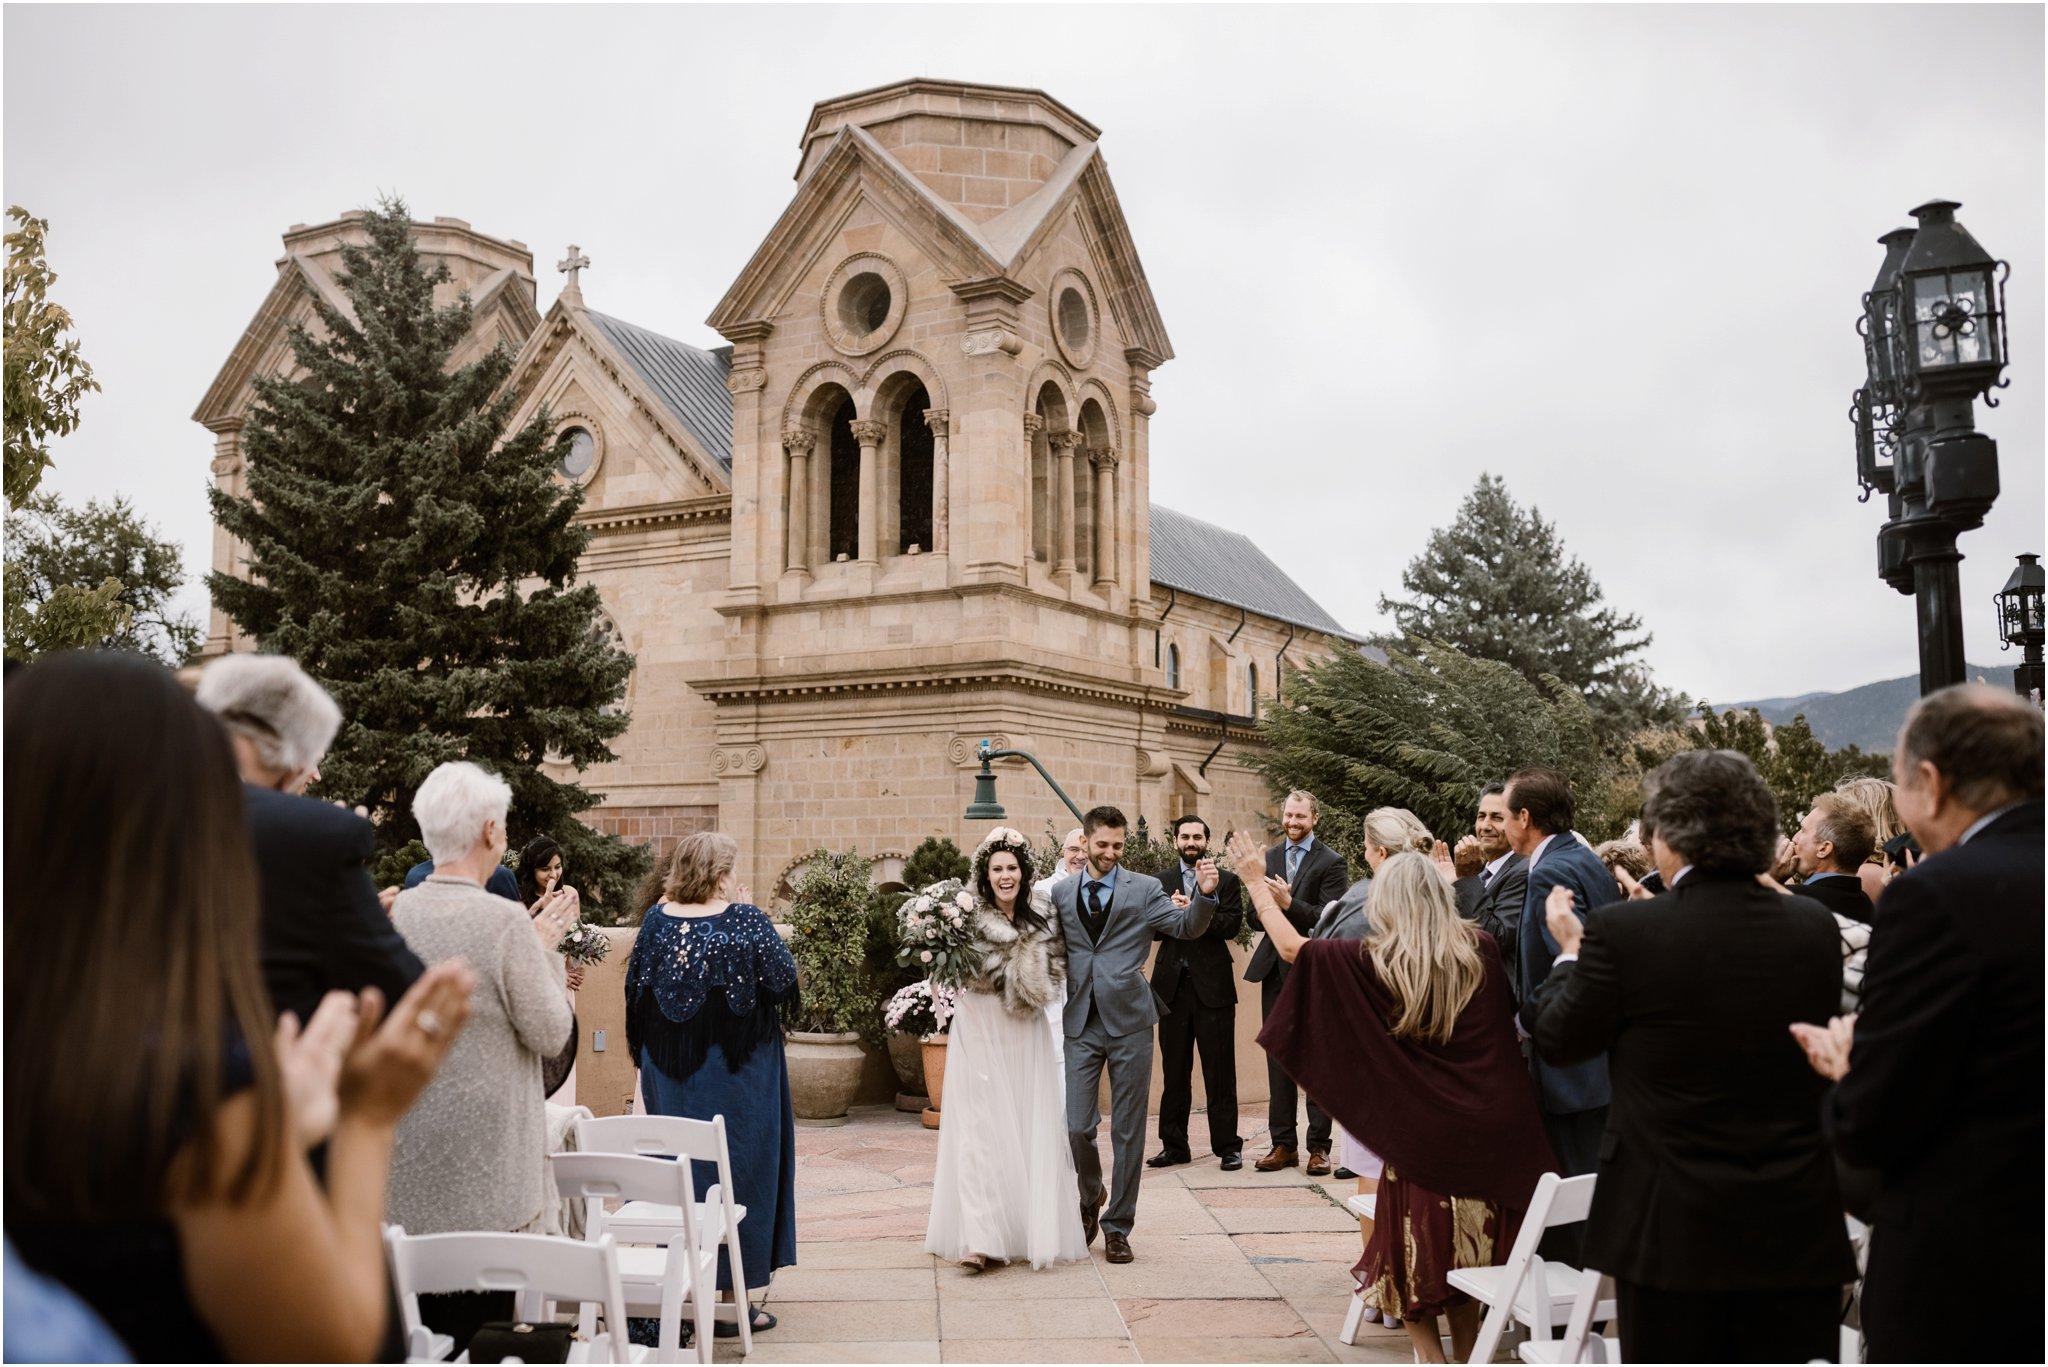 Santa Fe Wedding Photography at La Fonda Hotel